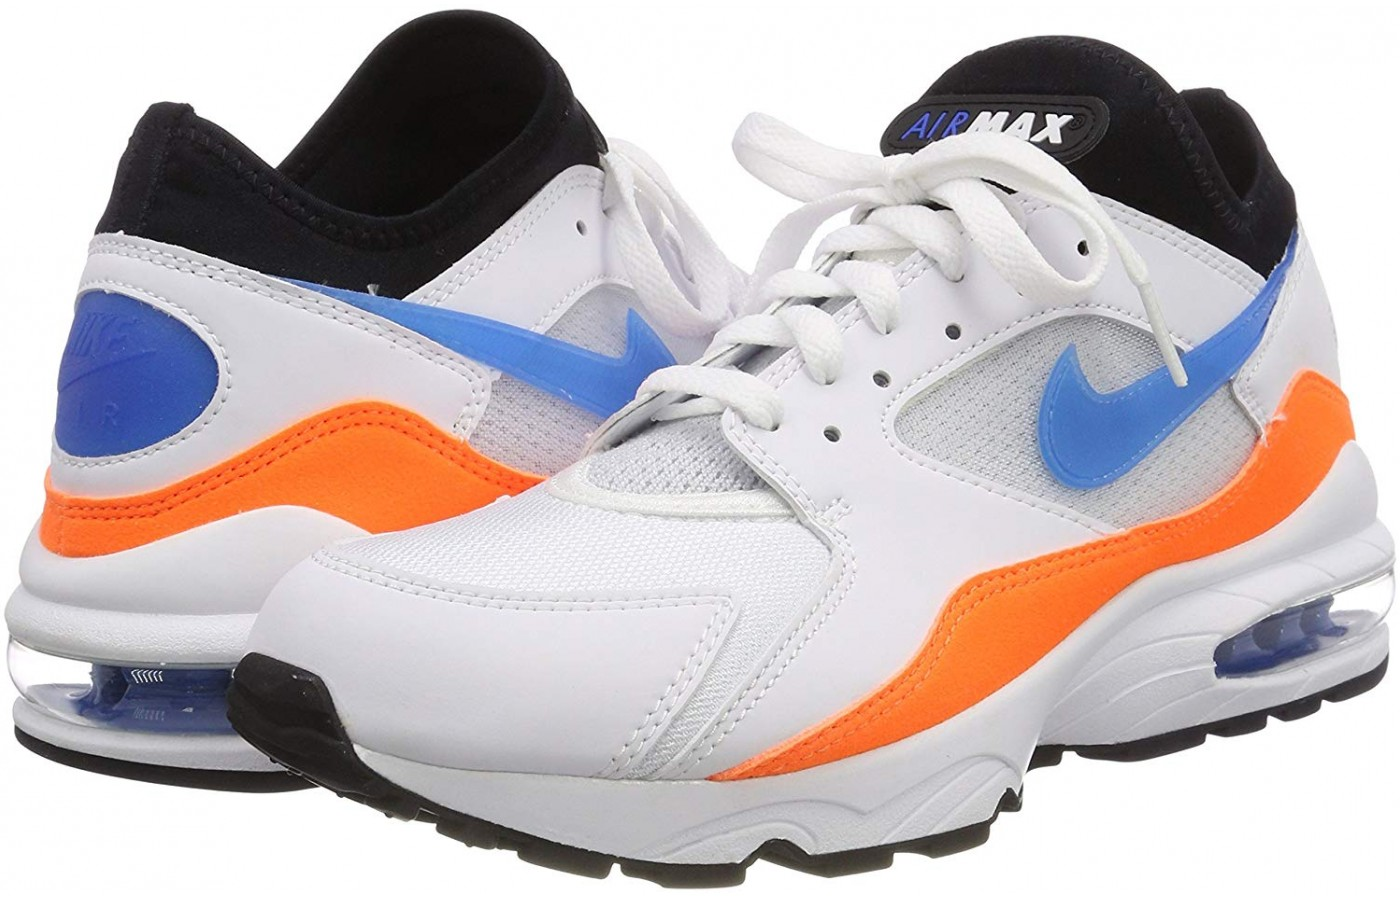 Air Max 93 pair